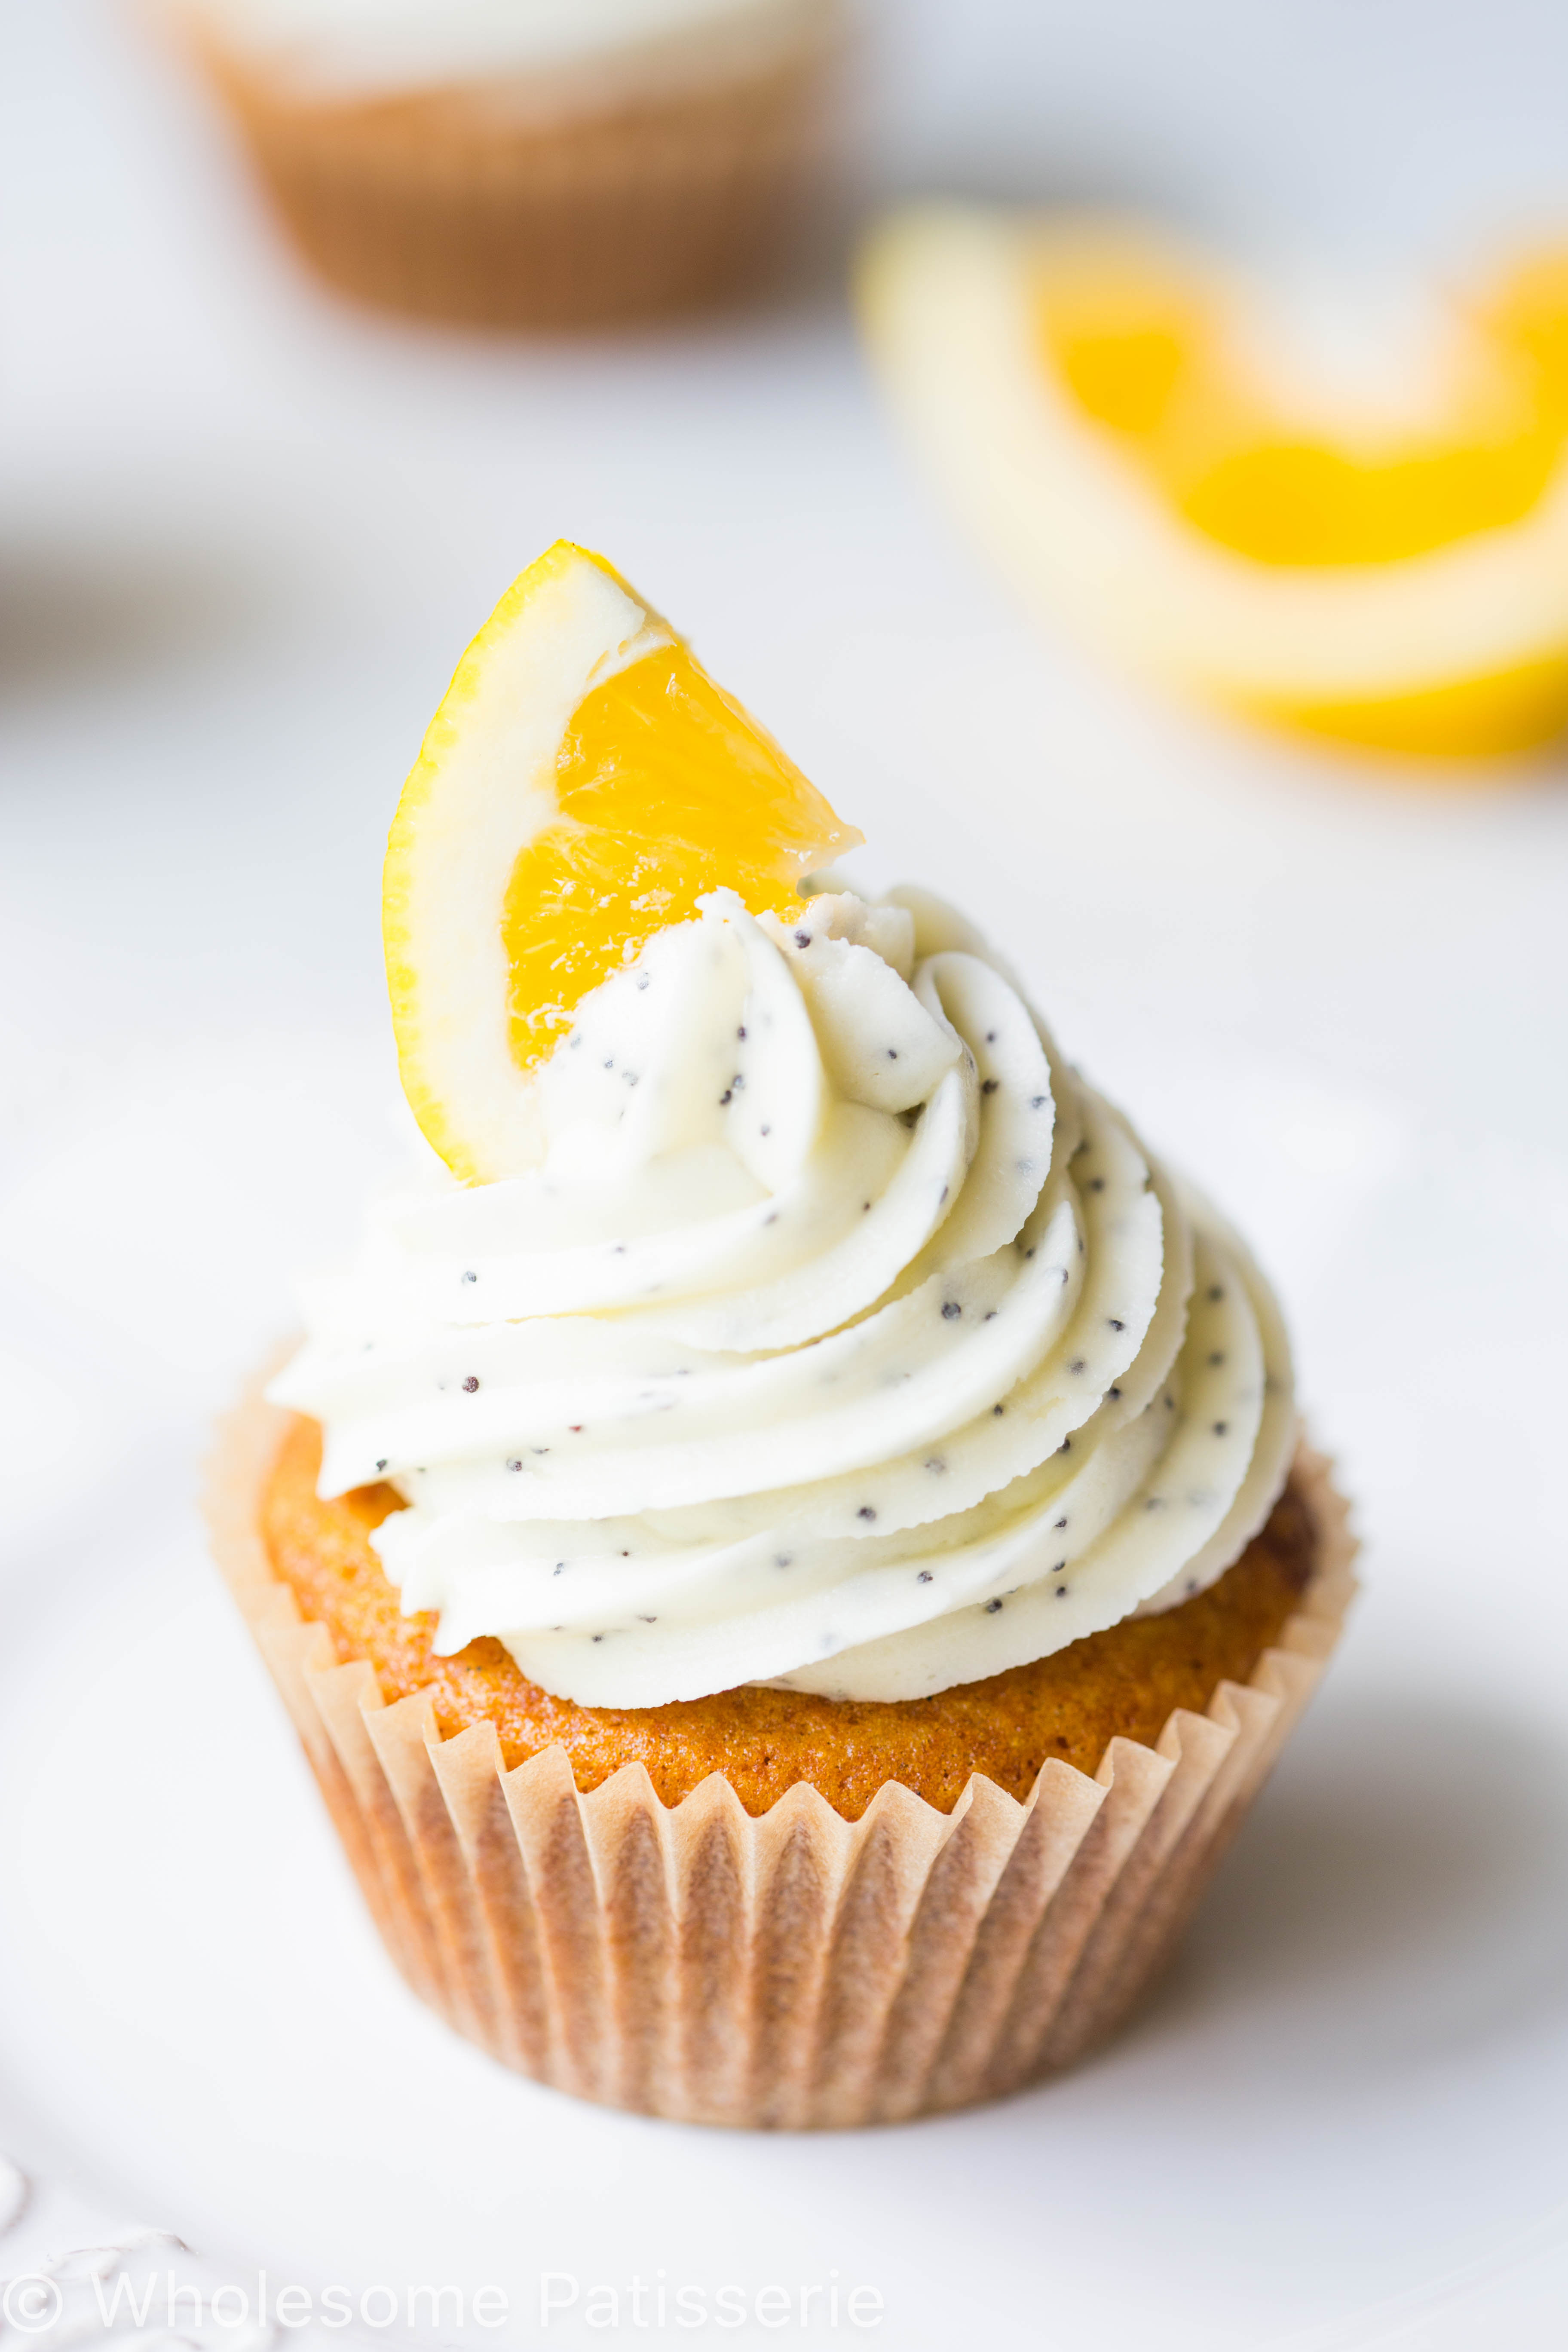 gluten-free-lemon-poppyseed-cupcakes-amazing-vanilla-butter-cupcake-lemon-curd-cupcake